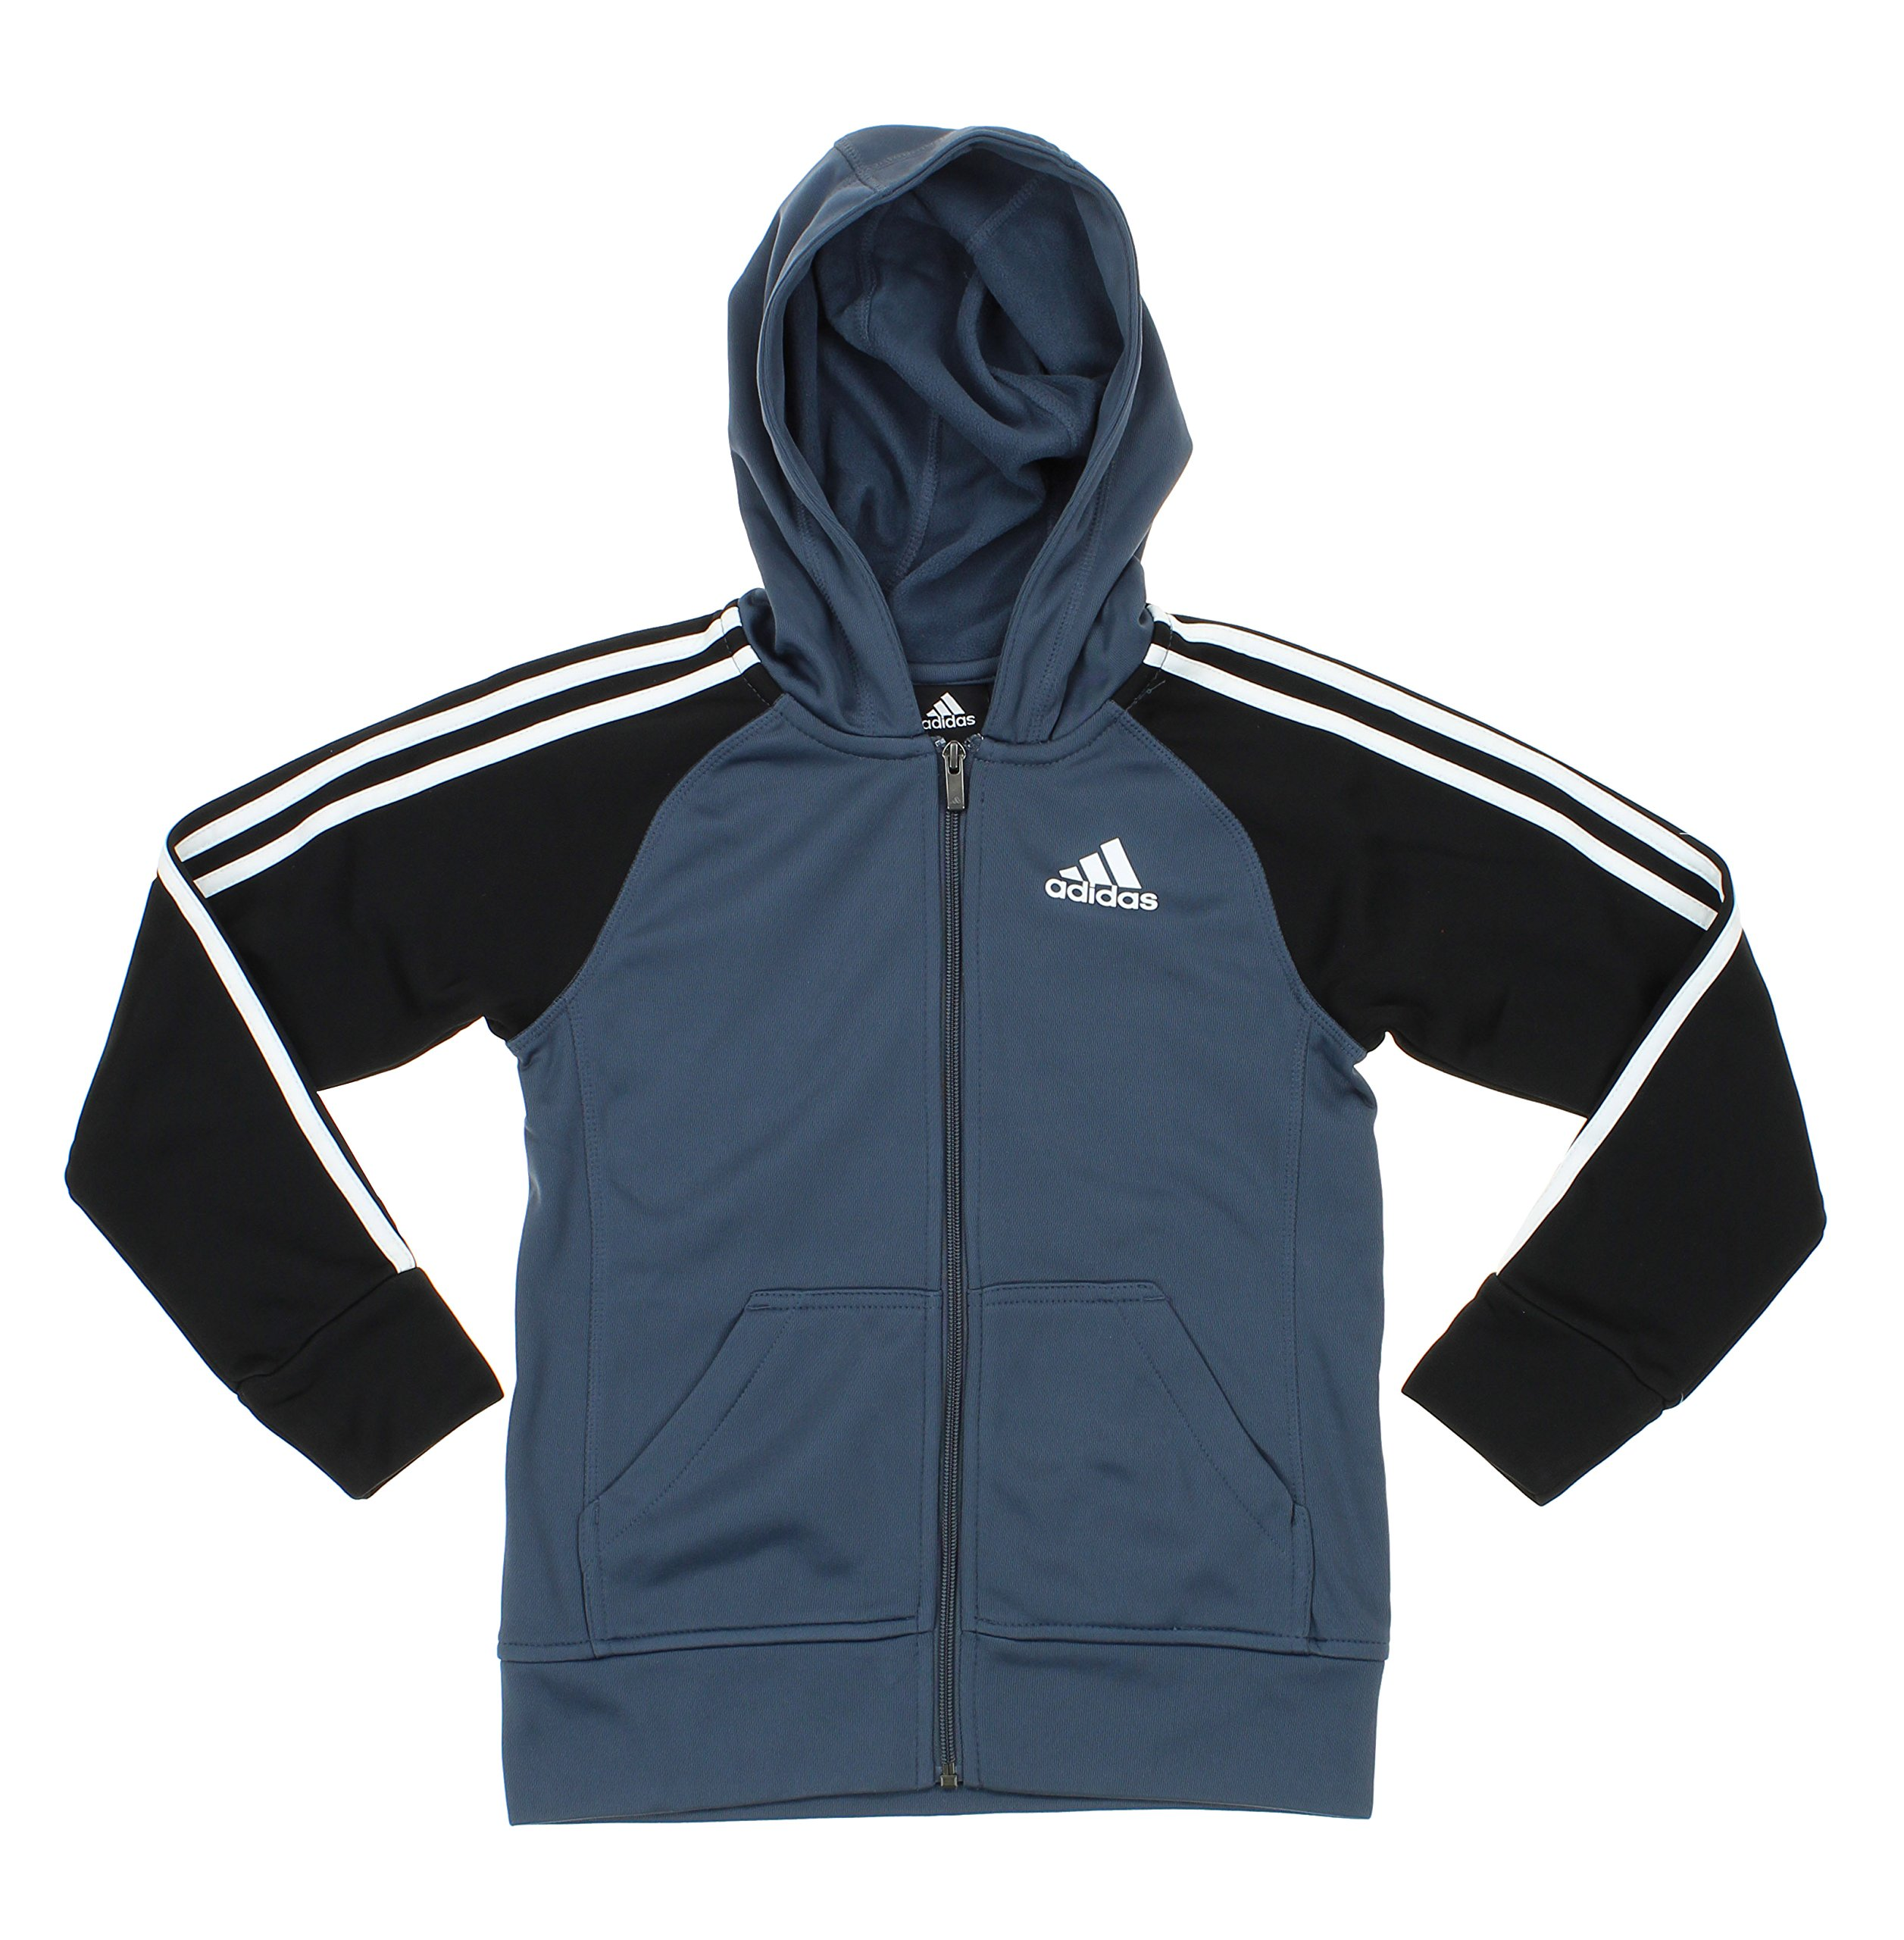 Adidas Youth Big Boys Full Zip Tech Fleece Hoodie, Grey